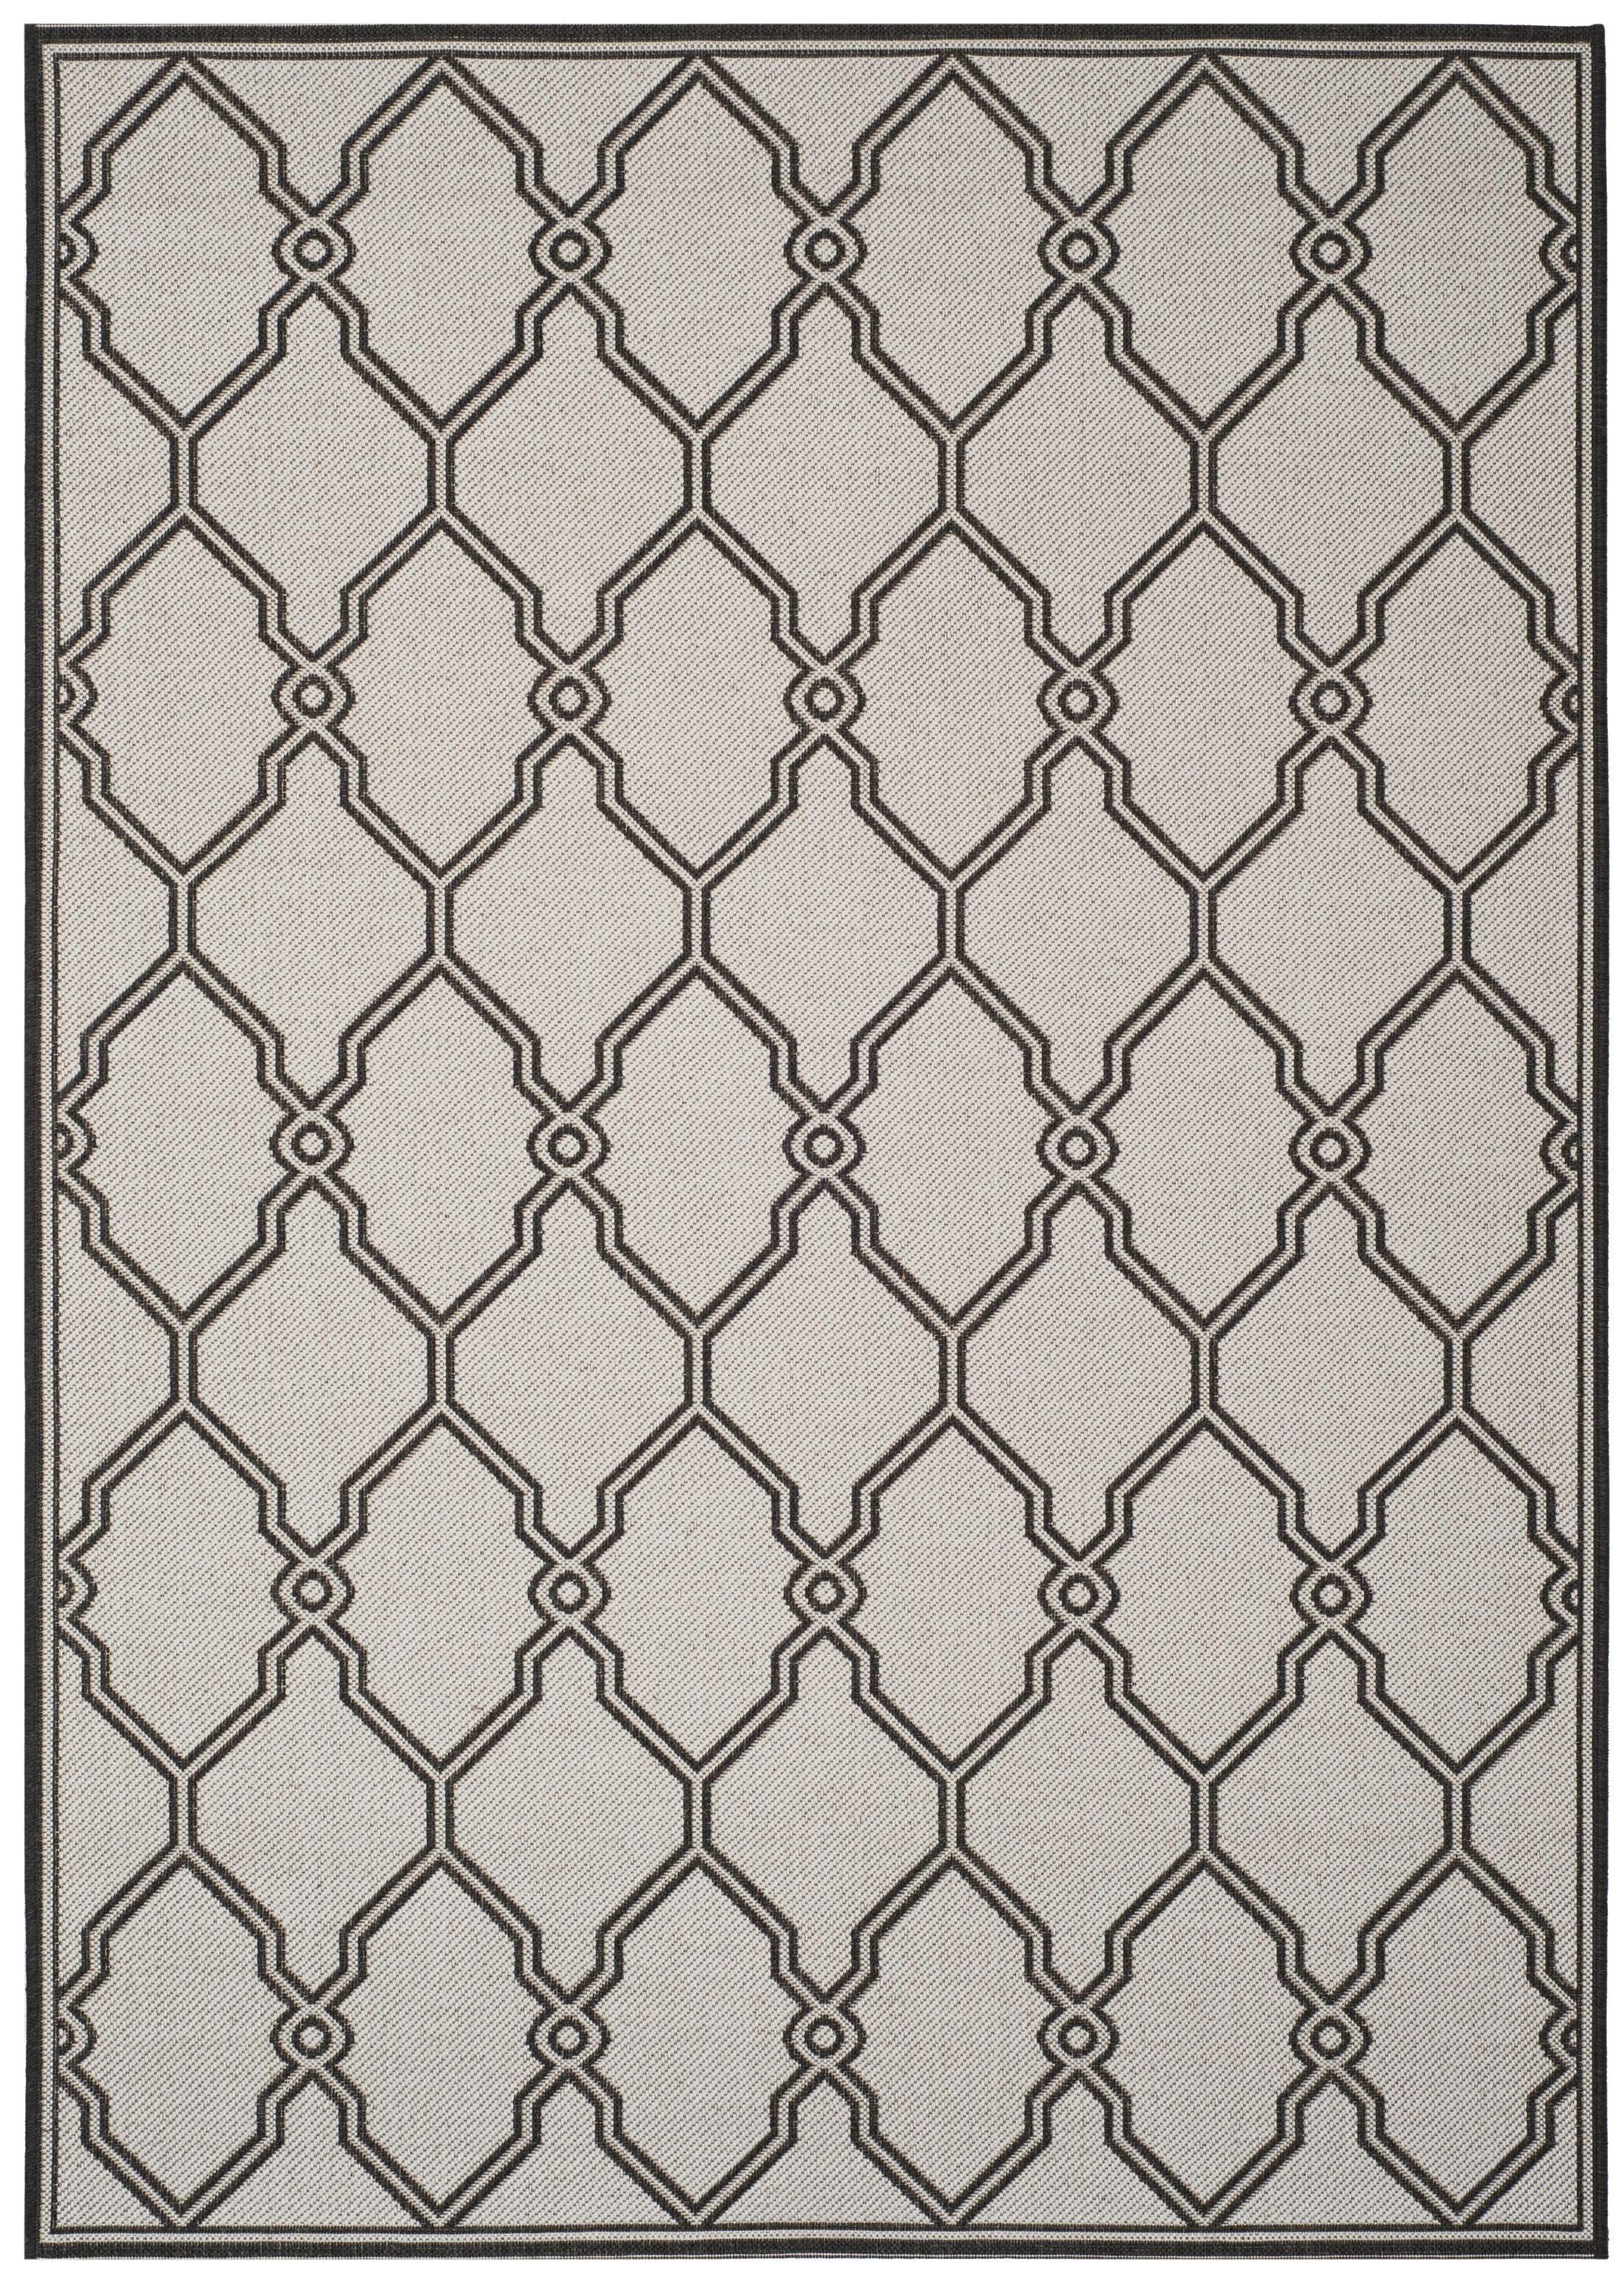 Miesha Contemporary Light Gray Area Rug Rug Size: Rectangle 5'1